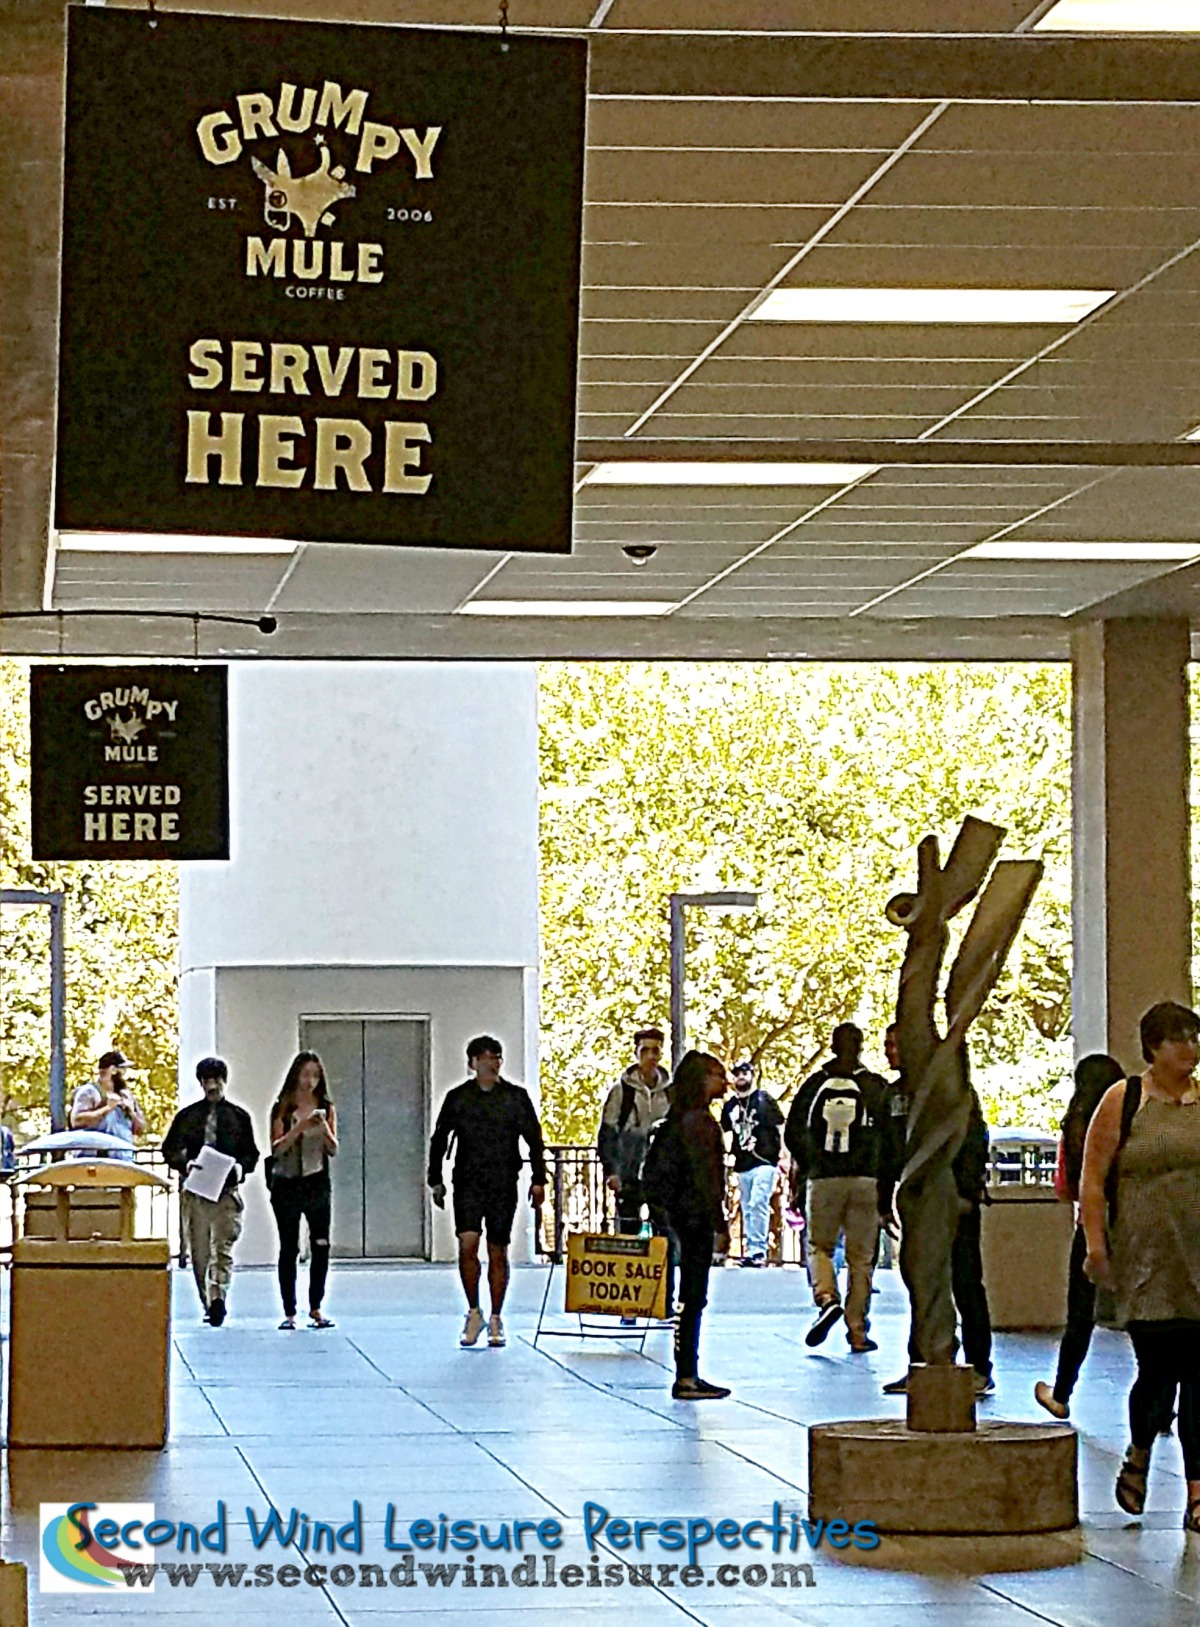 Students walking through library breezeway